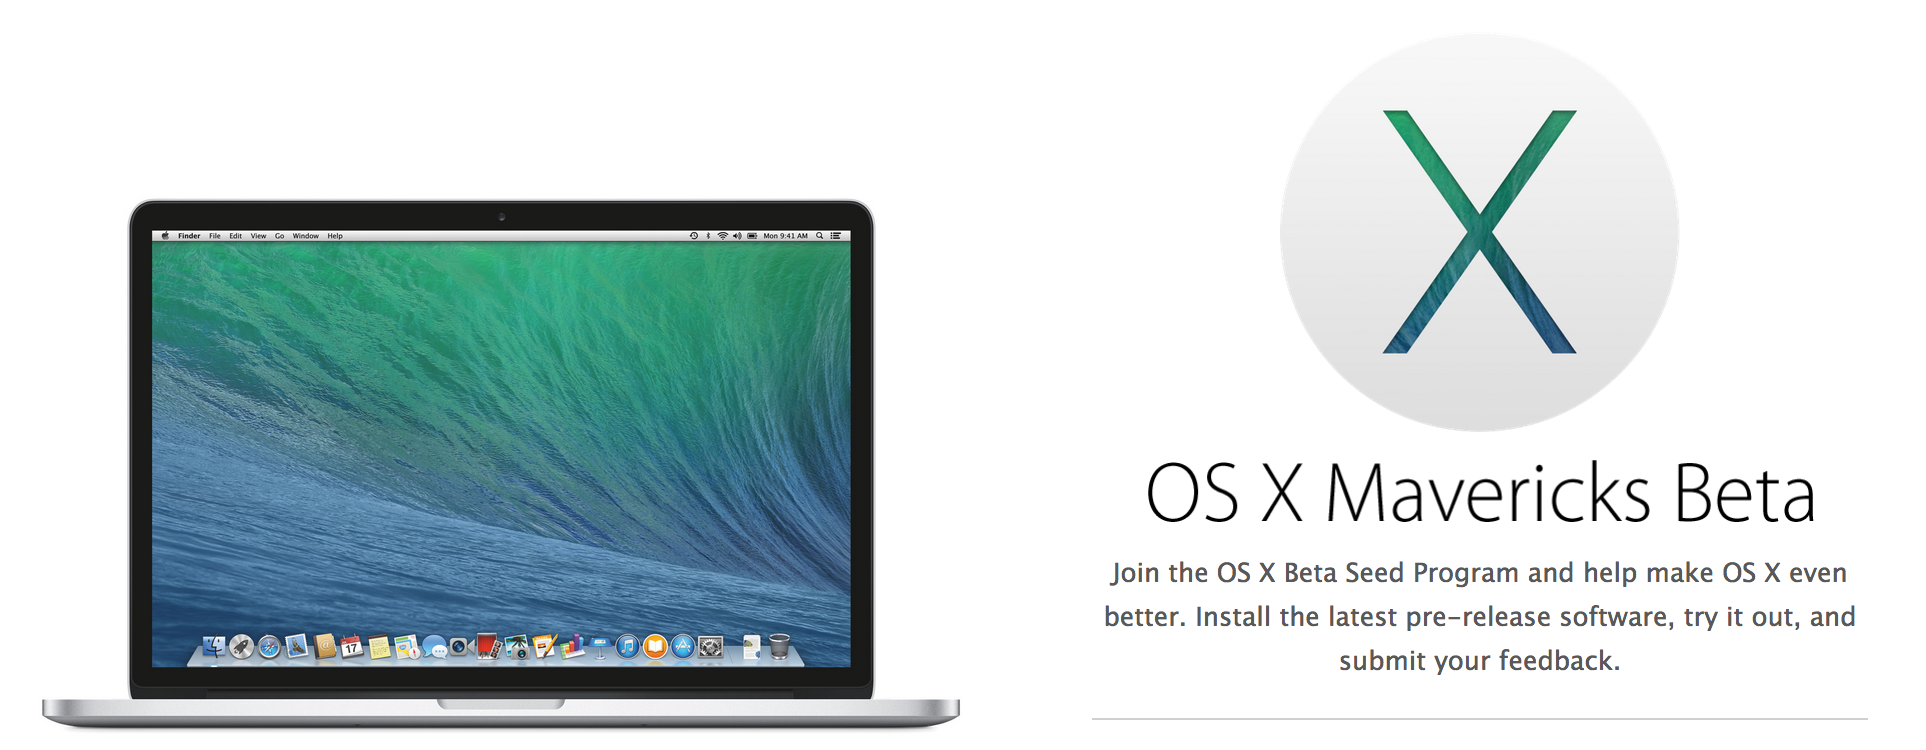 OS-X-Mavericks-Beta-Seed-program